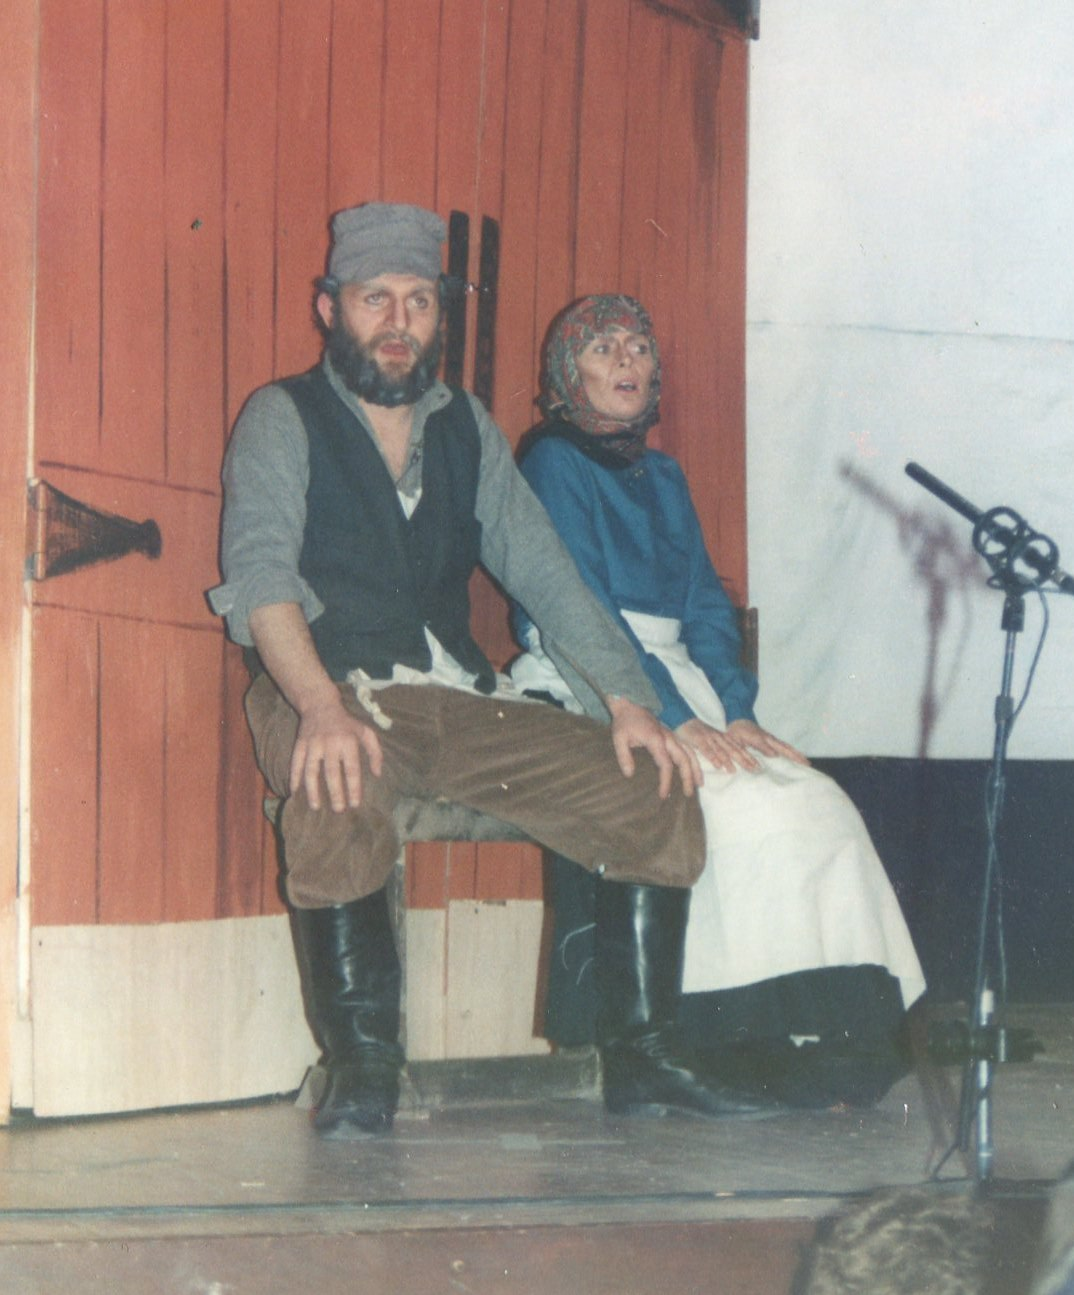 Fiddler on the Roof, 1991 (www.lmvg.ie) (14)